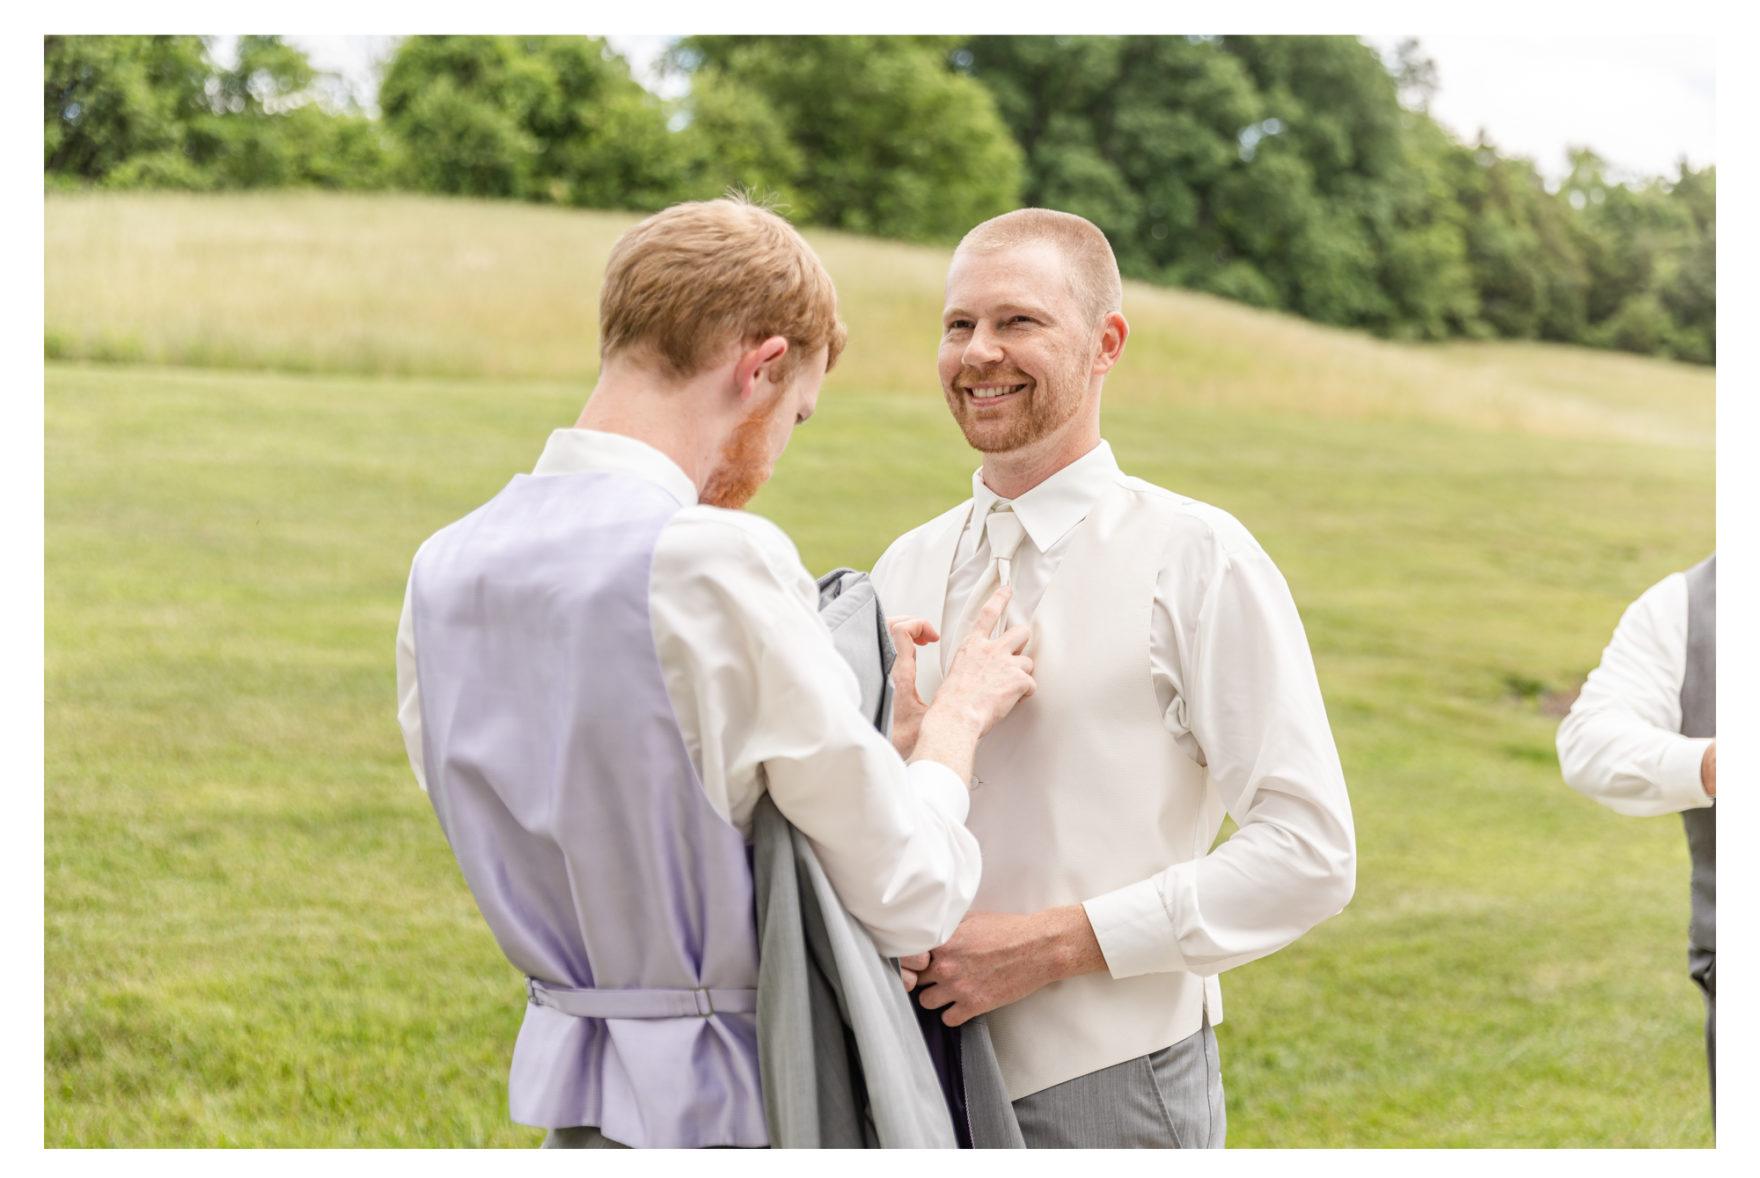 Summer Wedding Stone Ridge Hollow June Wedding Lavender dresses groom